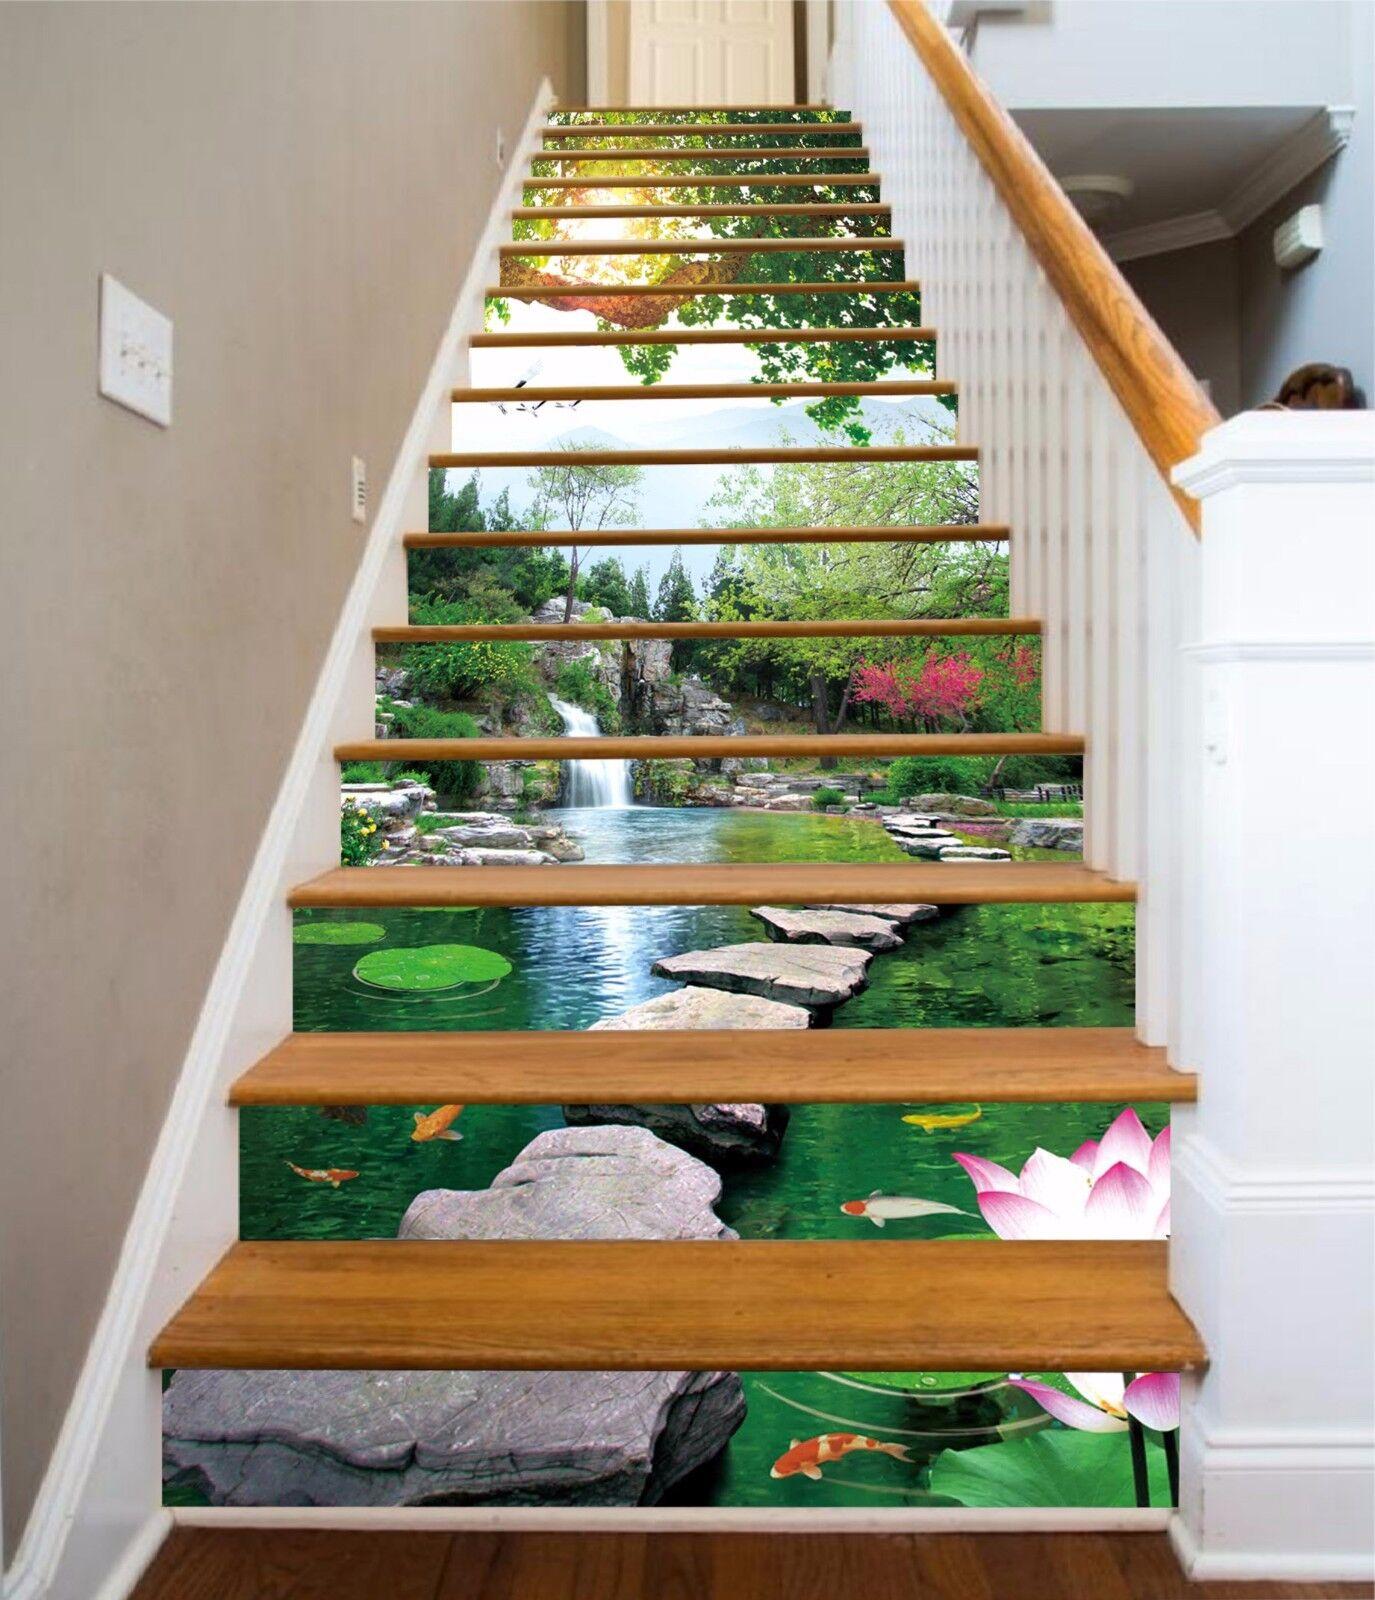 3D Lotus stone 354 Stair Risers Decoration Photo Mural Vinyl Decal Wallpaper UK